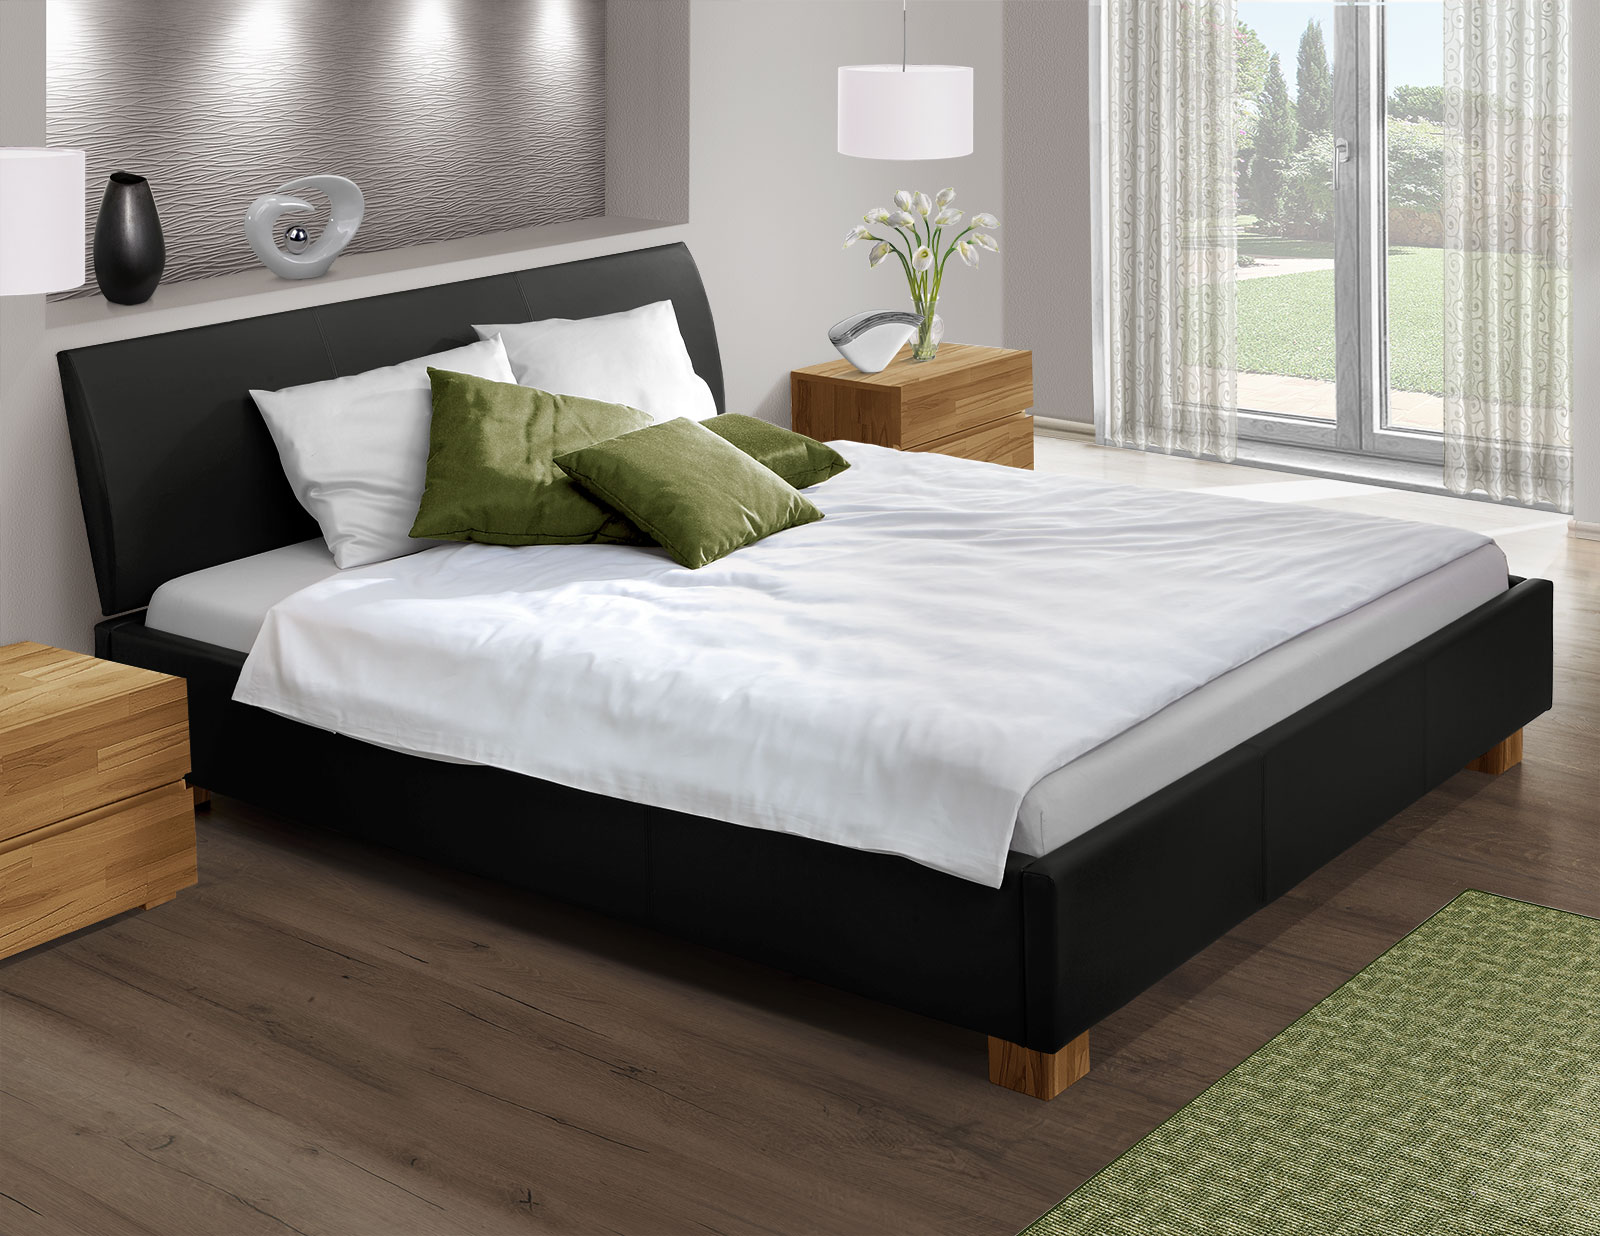 Bett mit Echtleder z. B. in Schwarz 180x200 cm - Serpa